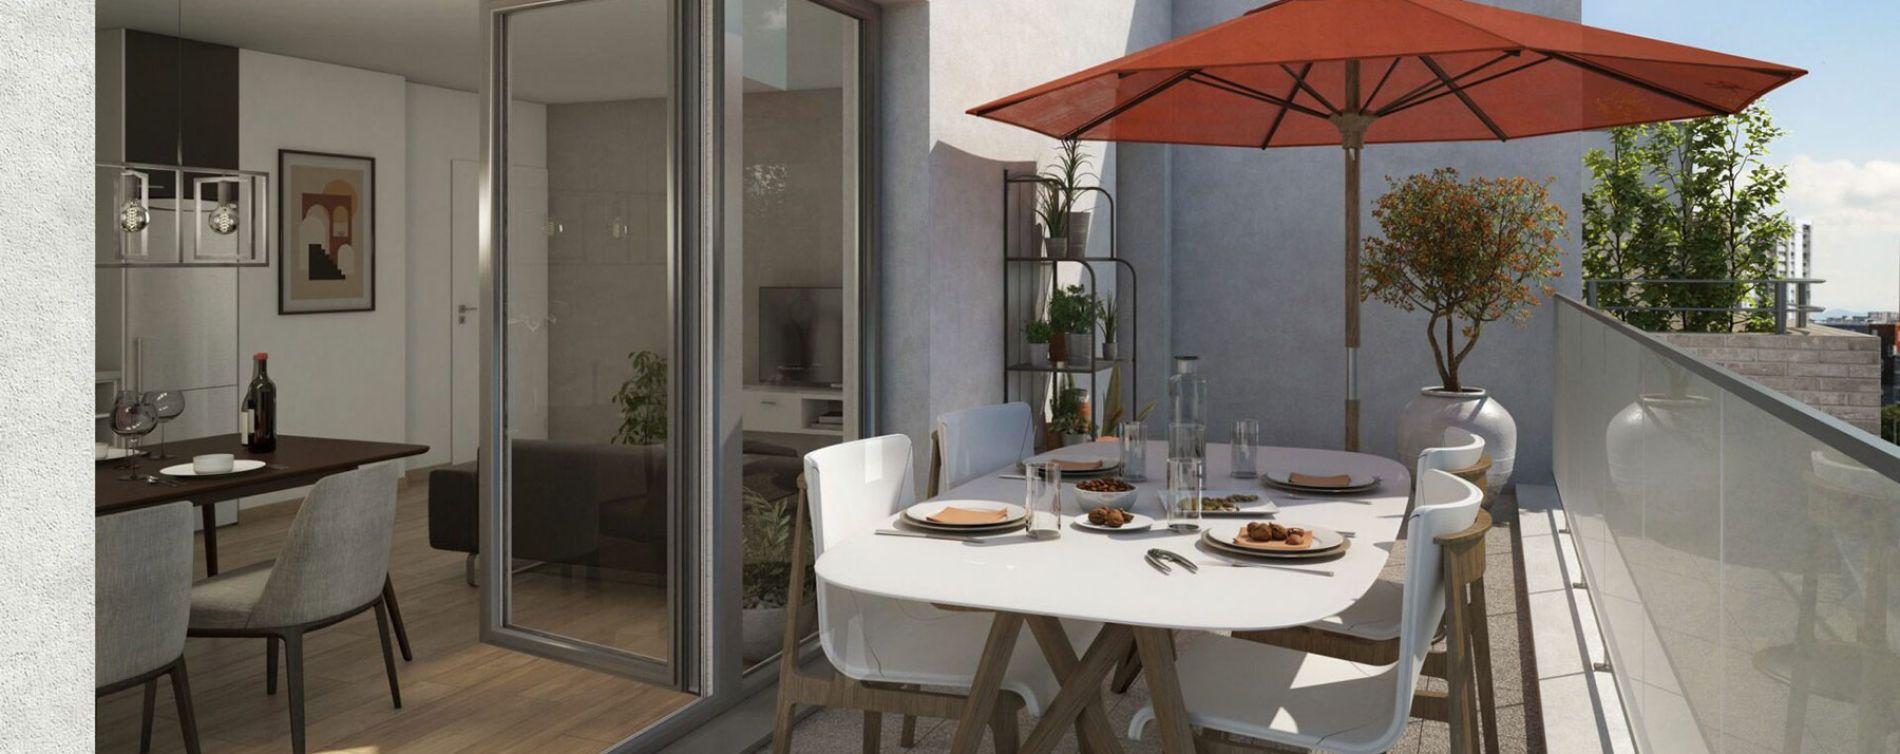 Bobigny : programme immobilier neuve « Programme immobilier n°218860 » en Loi Pinel (3)